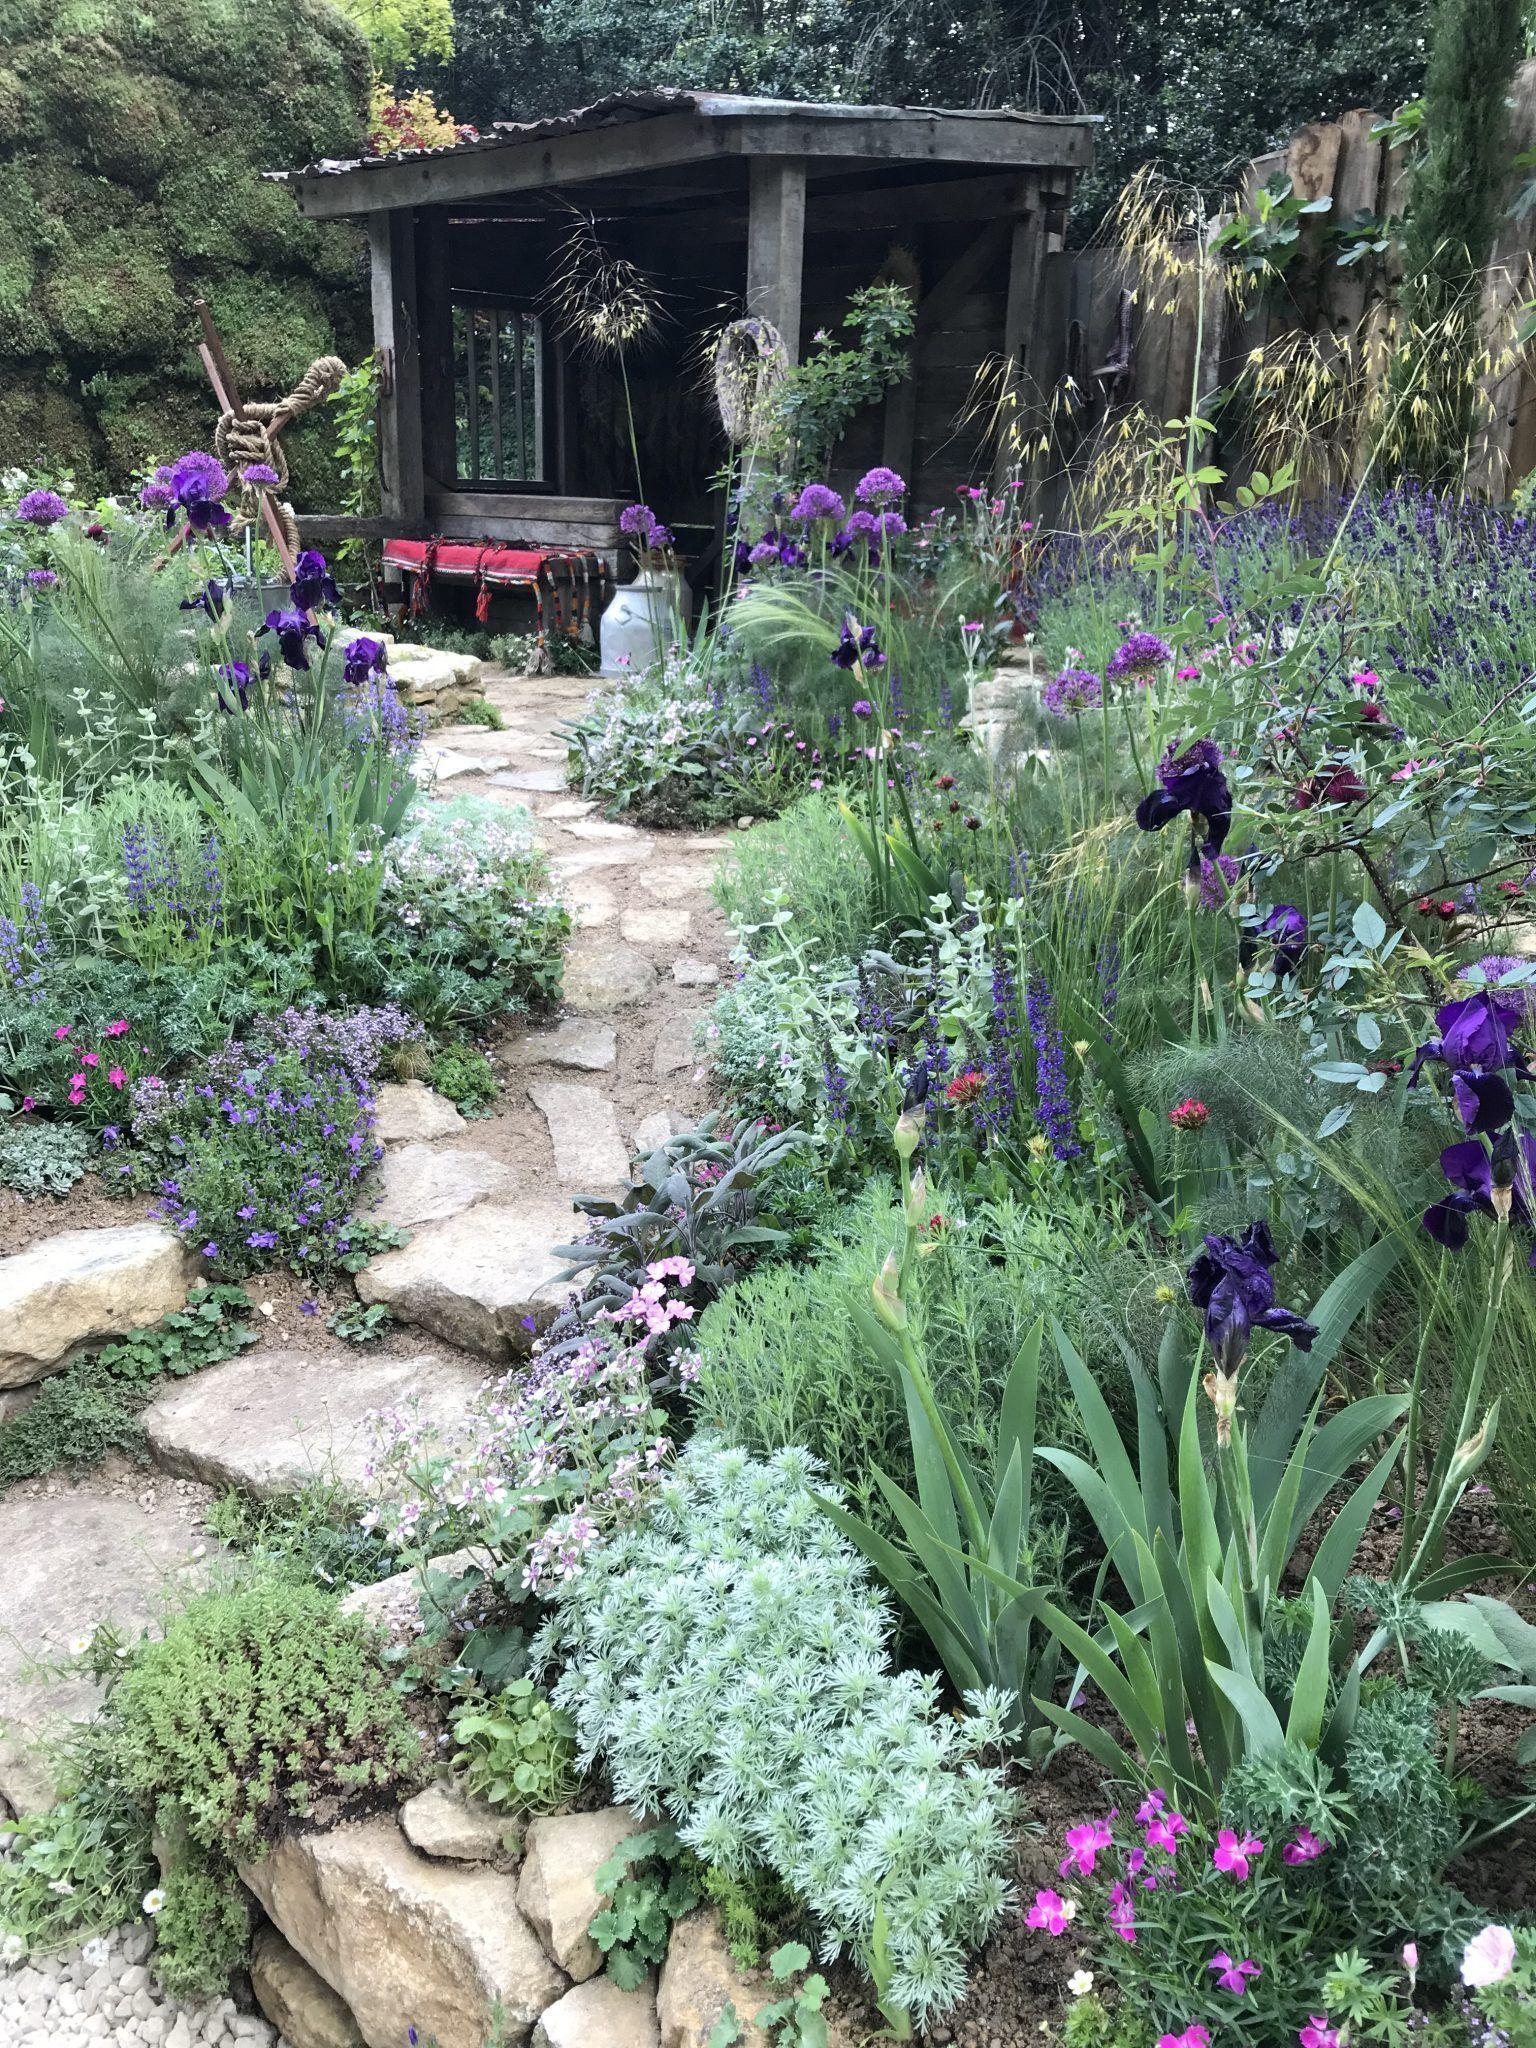 14 Things at RHS Chelsea Flower Show 2019  Jack Wallington Garden Design Clapham in London